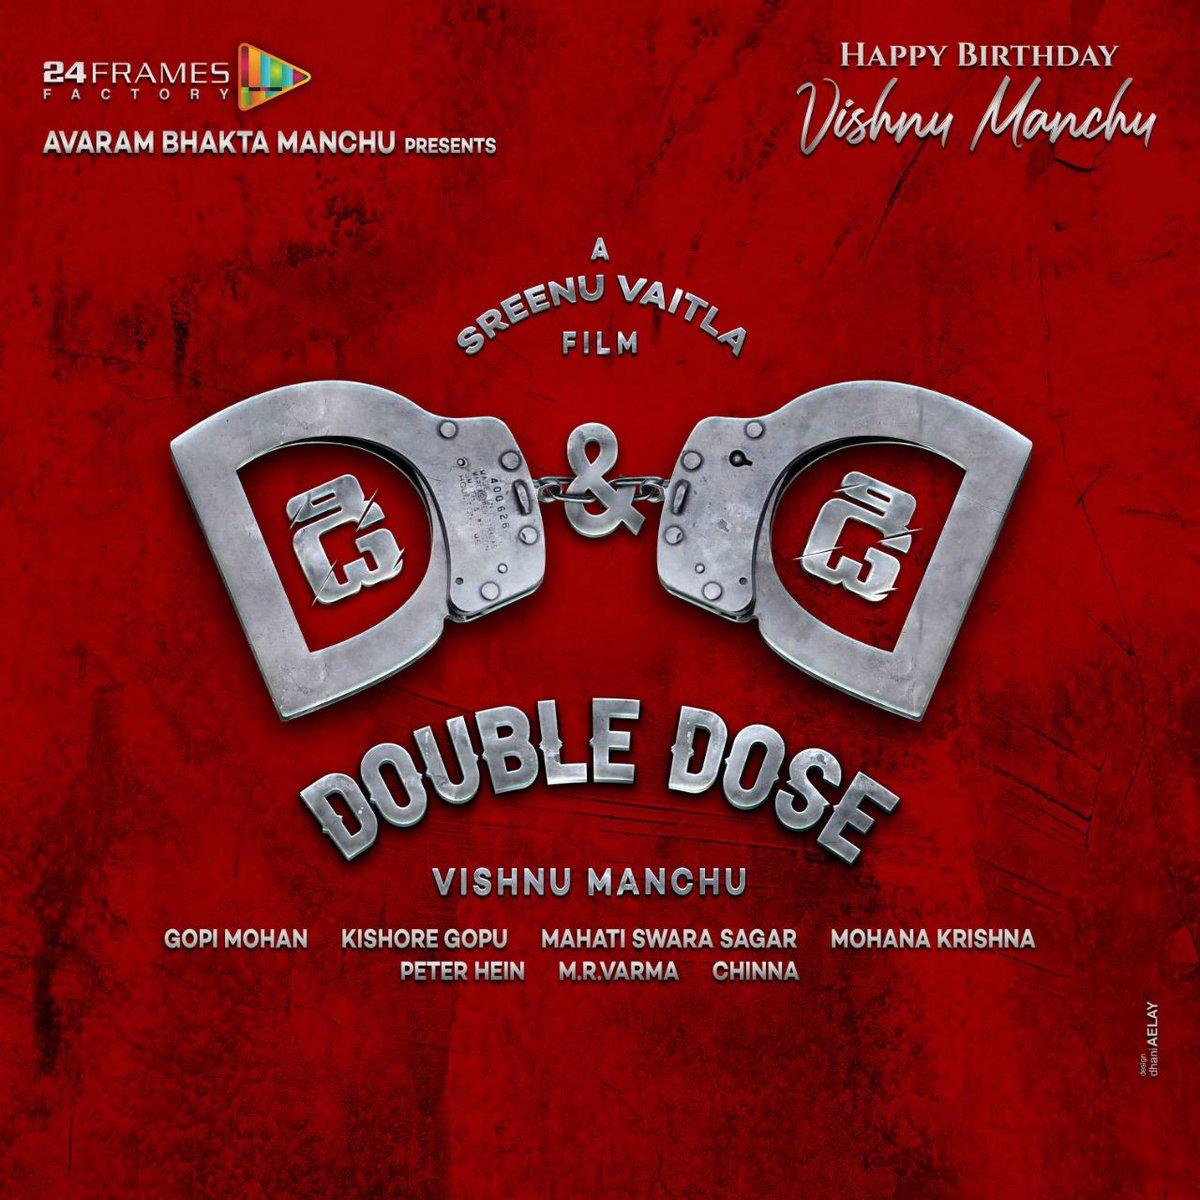 D&D - #DoubleDose   @iVishnuManchu and @SreenuVaitla team for the second time after the blockbuster #Dhee  A musical of @mahathi_sagar 🎼  @Gopimohan @24FramesFactory @PeterHeinOffl @ursvamsishekar @onlynikil   #HBDVishnuManchu